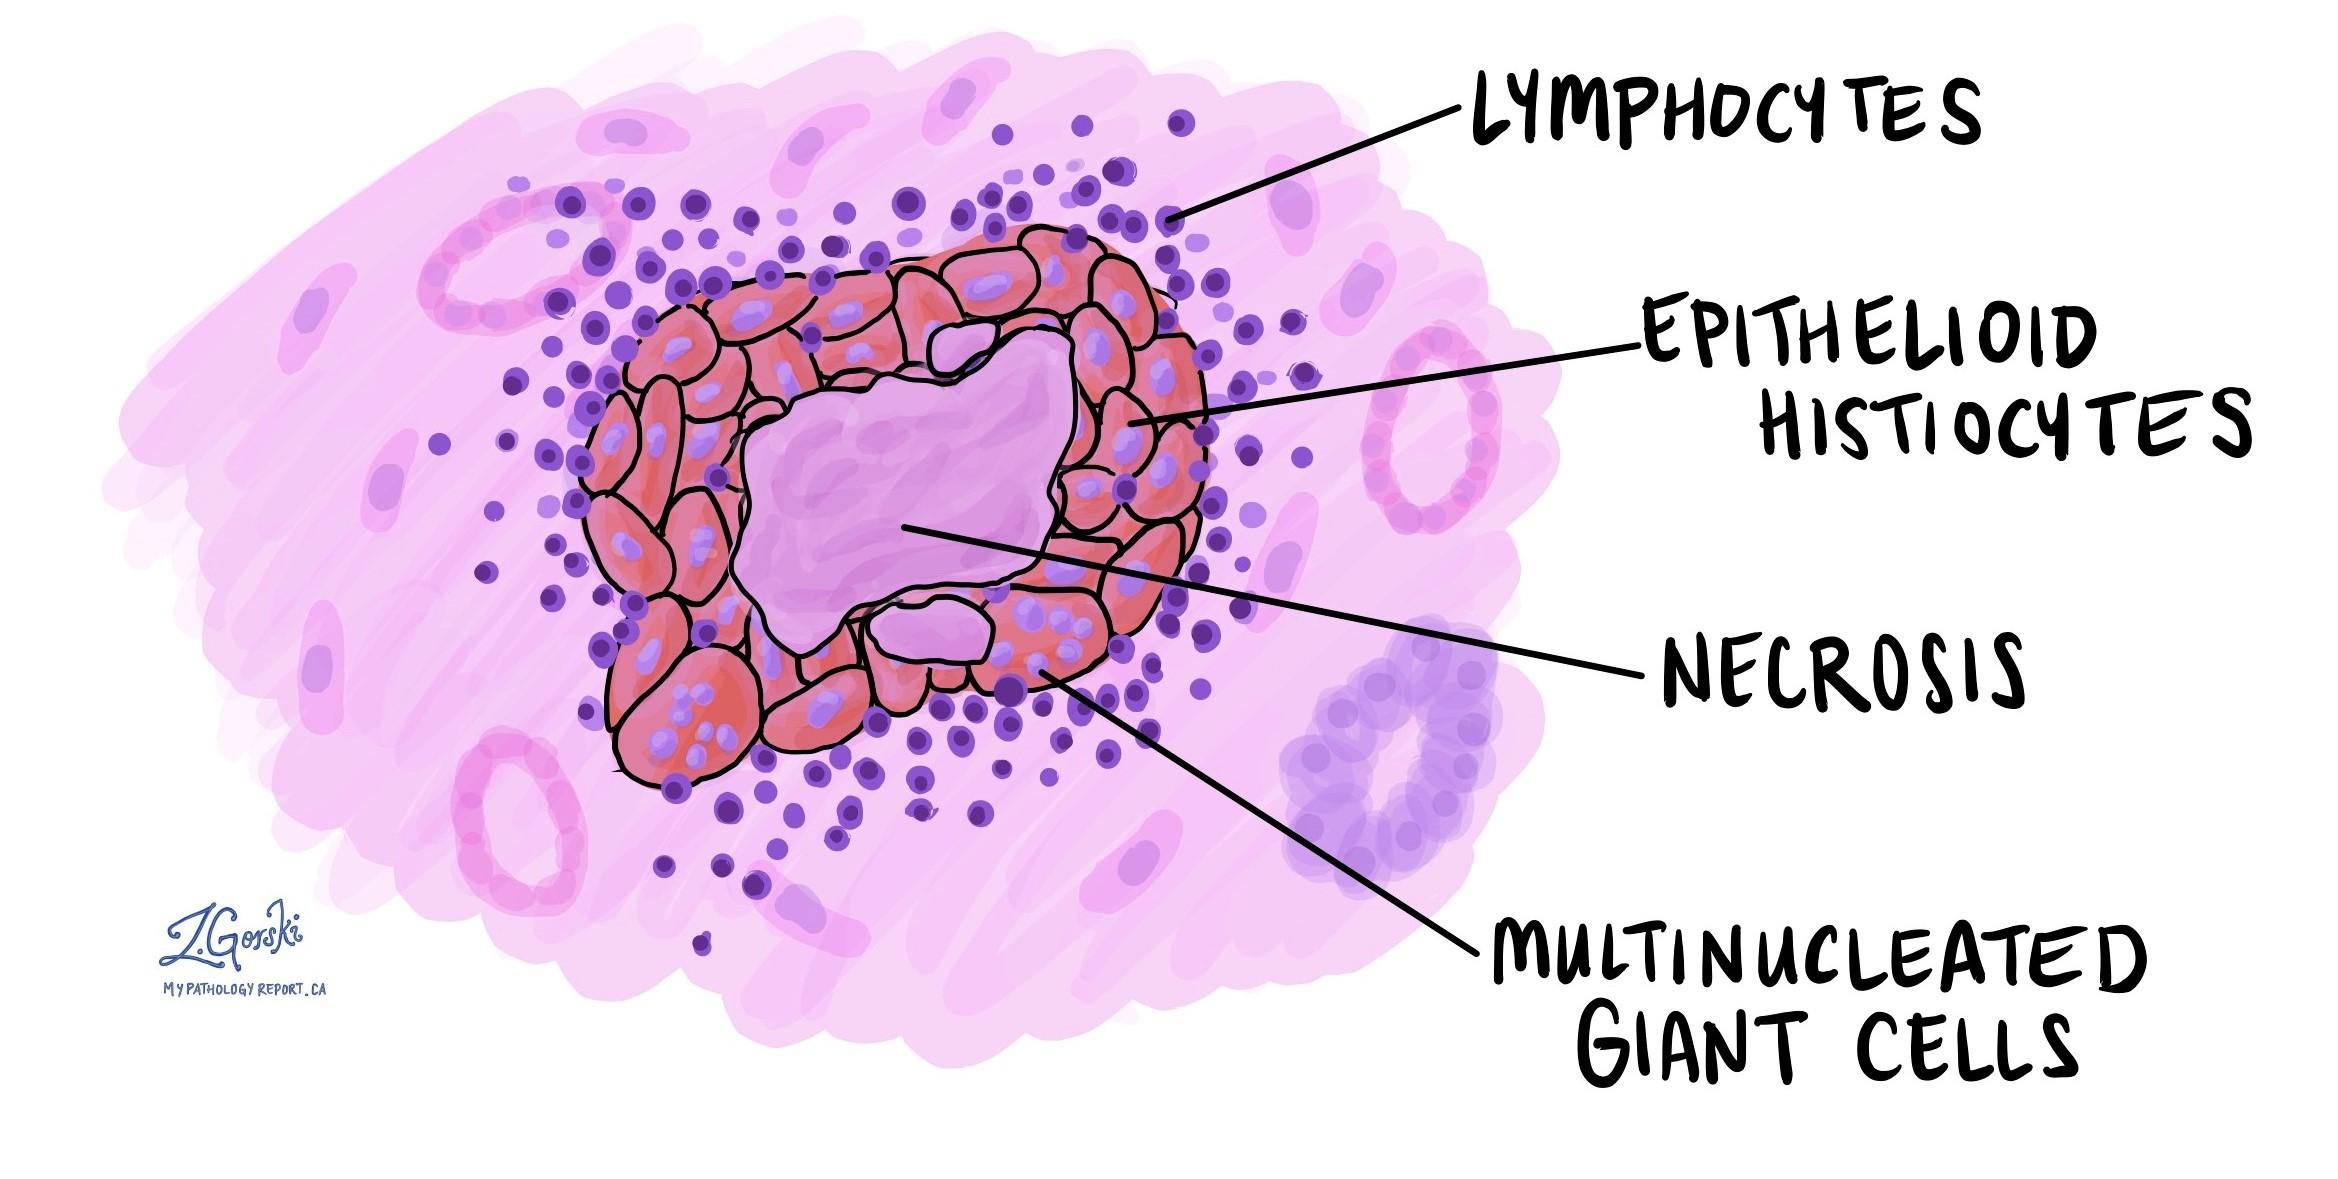 Necrotizing granulomatous inflammation